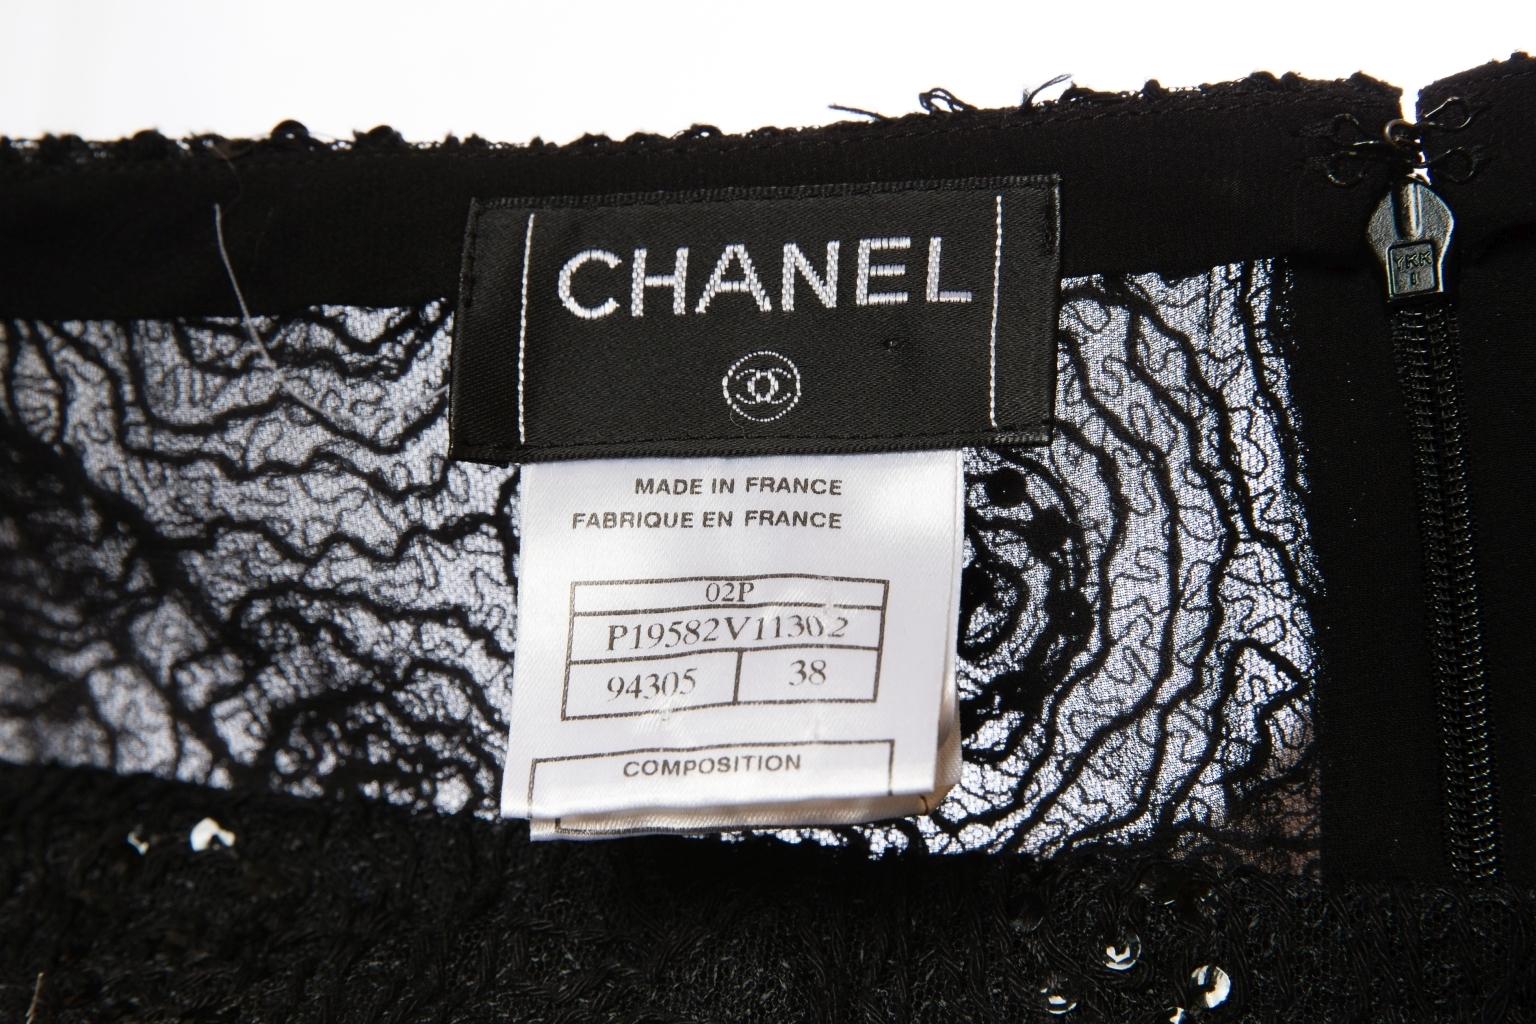 Вечерняя черная кружевная юбка, расшитая пайетками, Chanel, 38 размер.